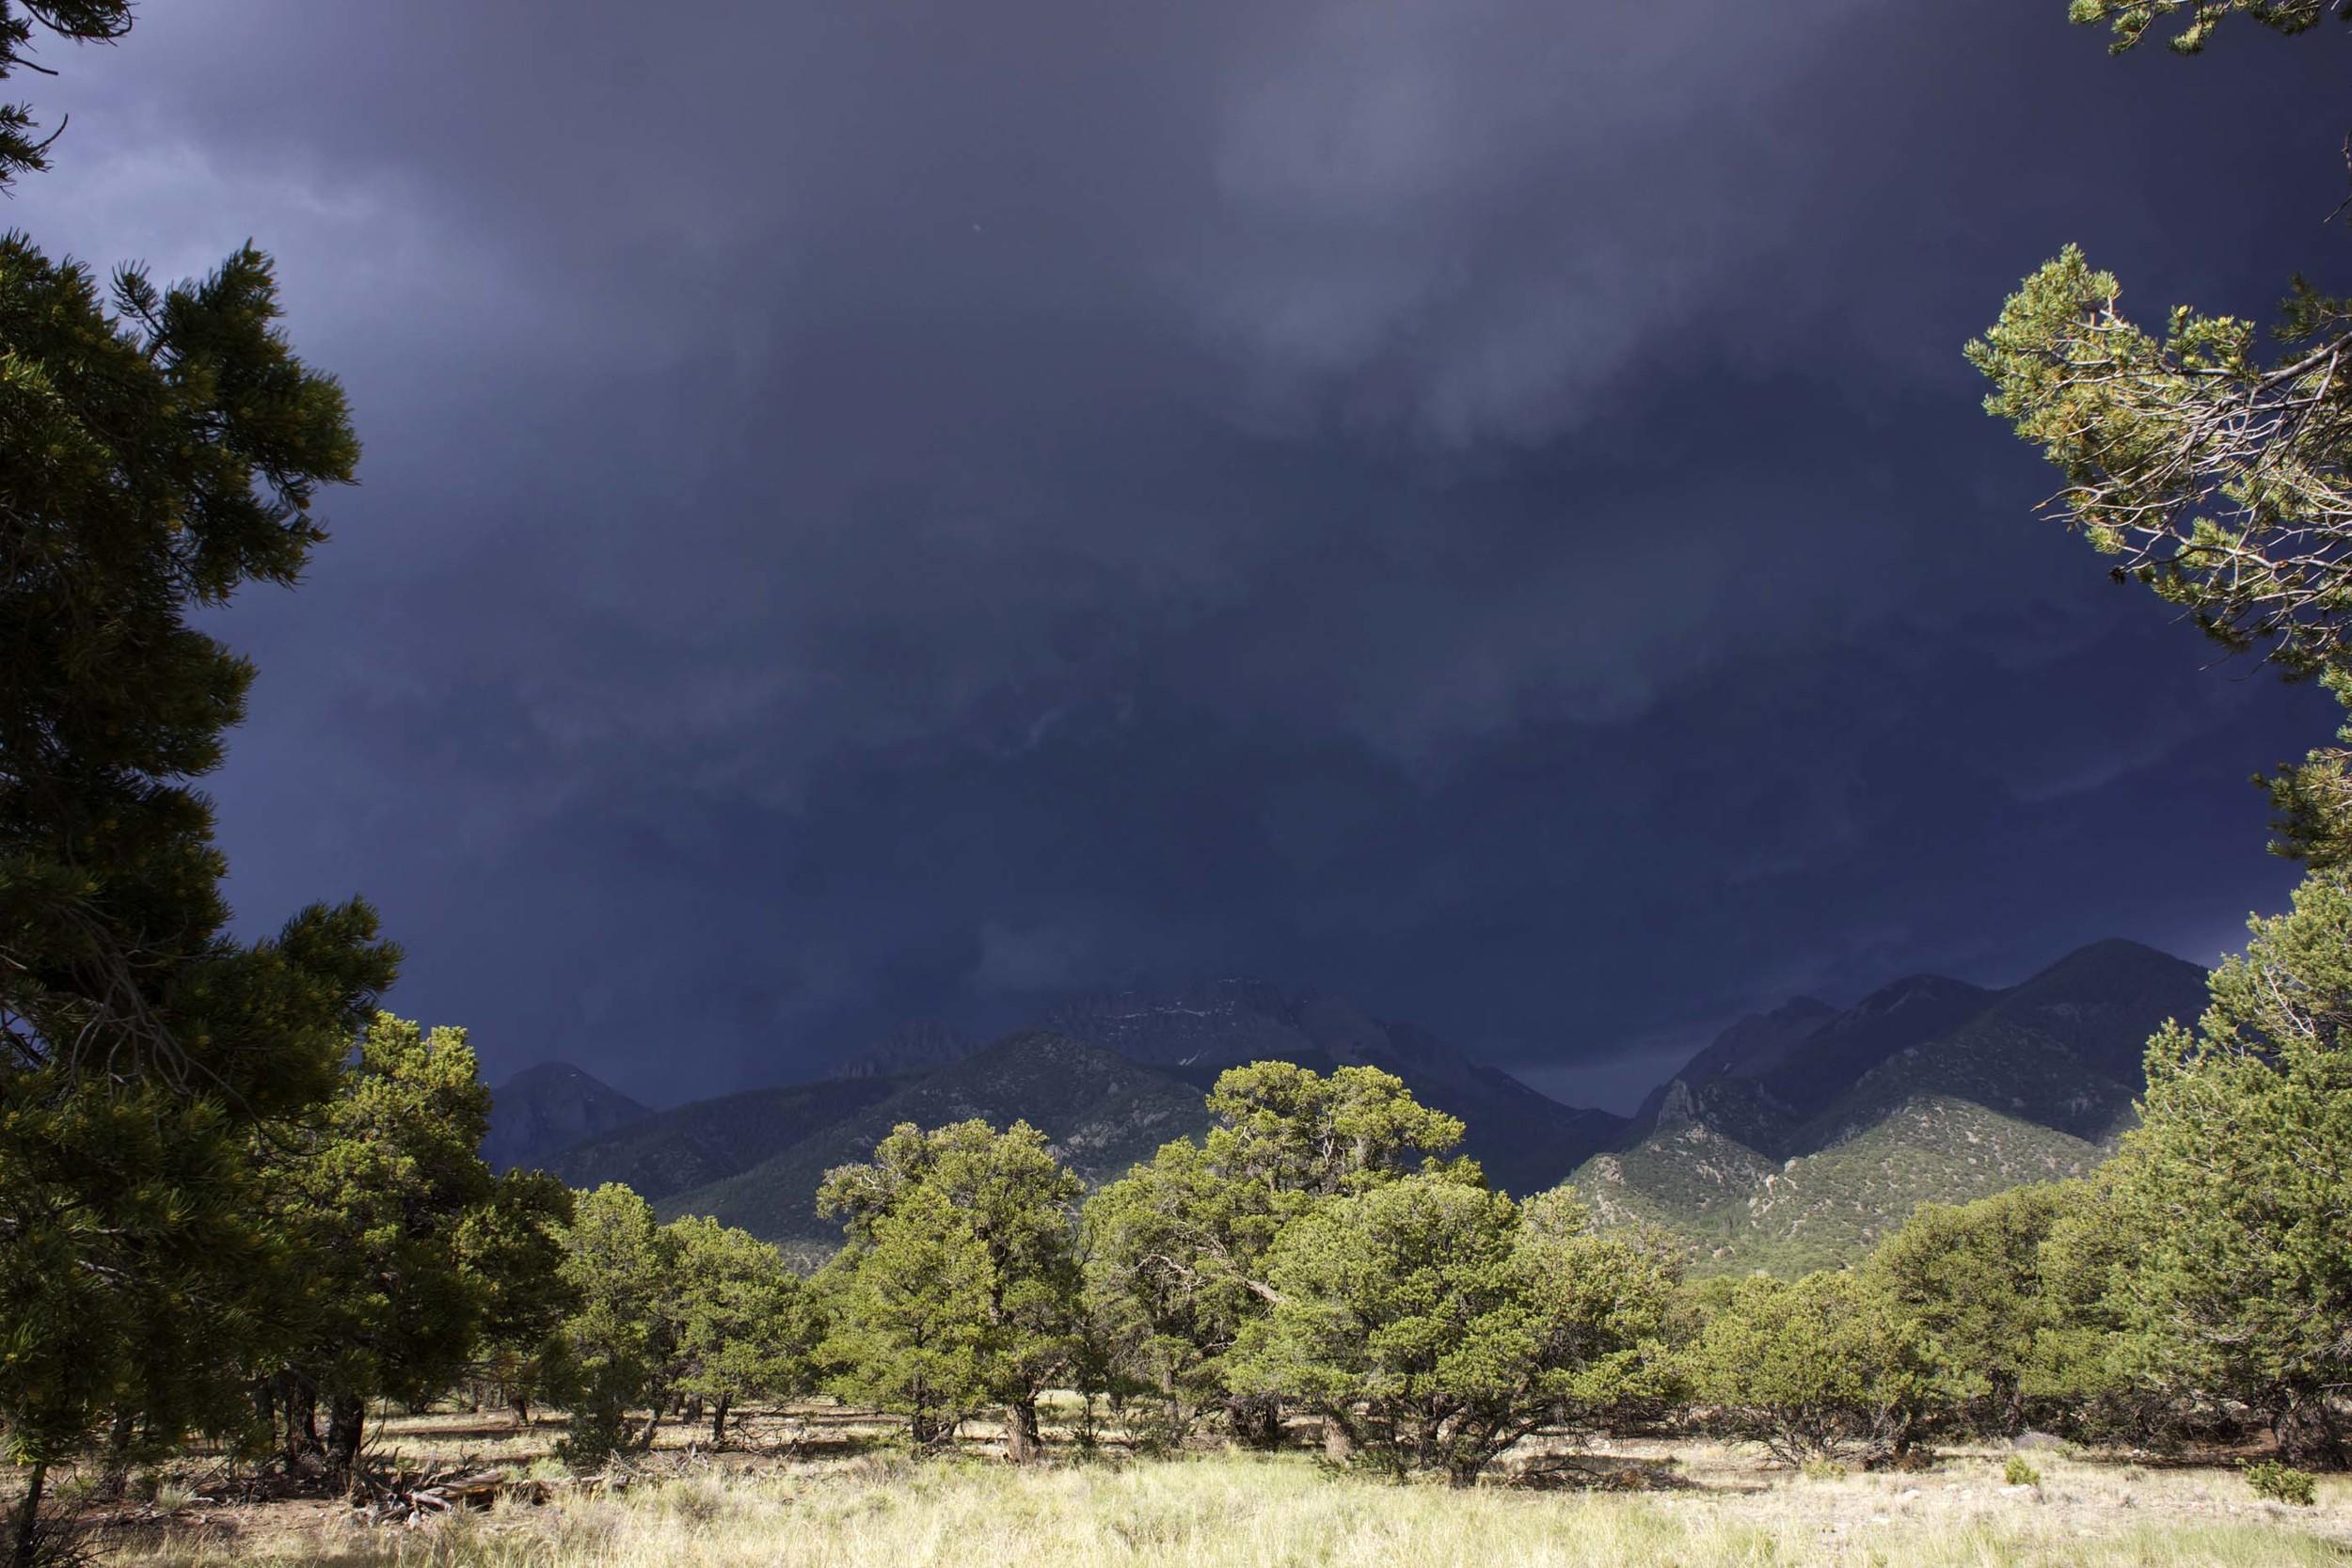 site-6.18.13 RAW severe T-storm warning 2.jpg